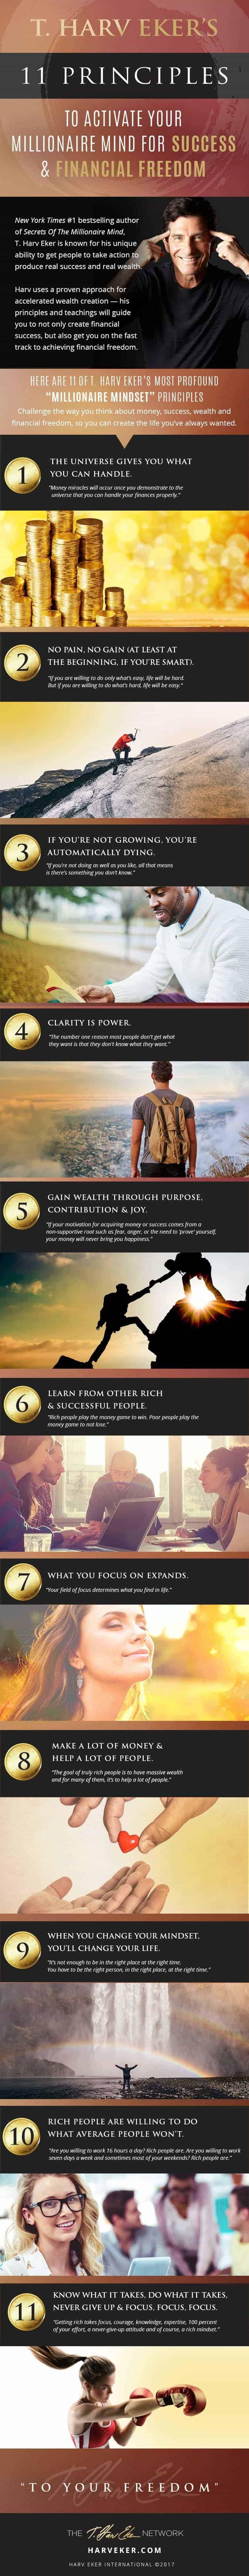 11-principles-infographic2-1